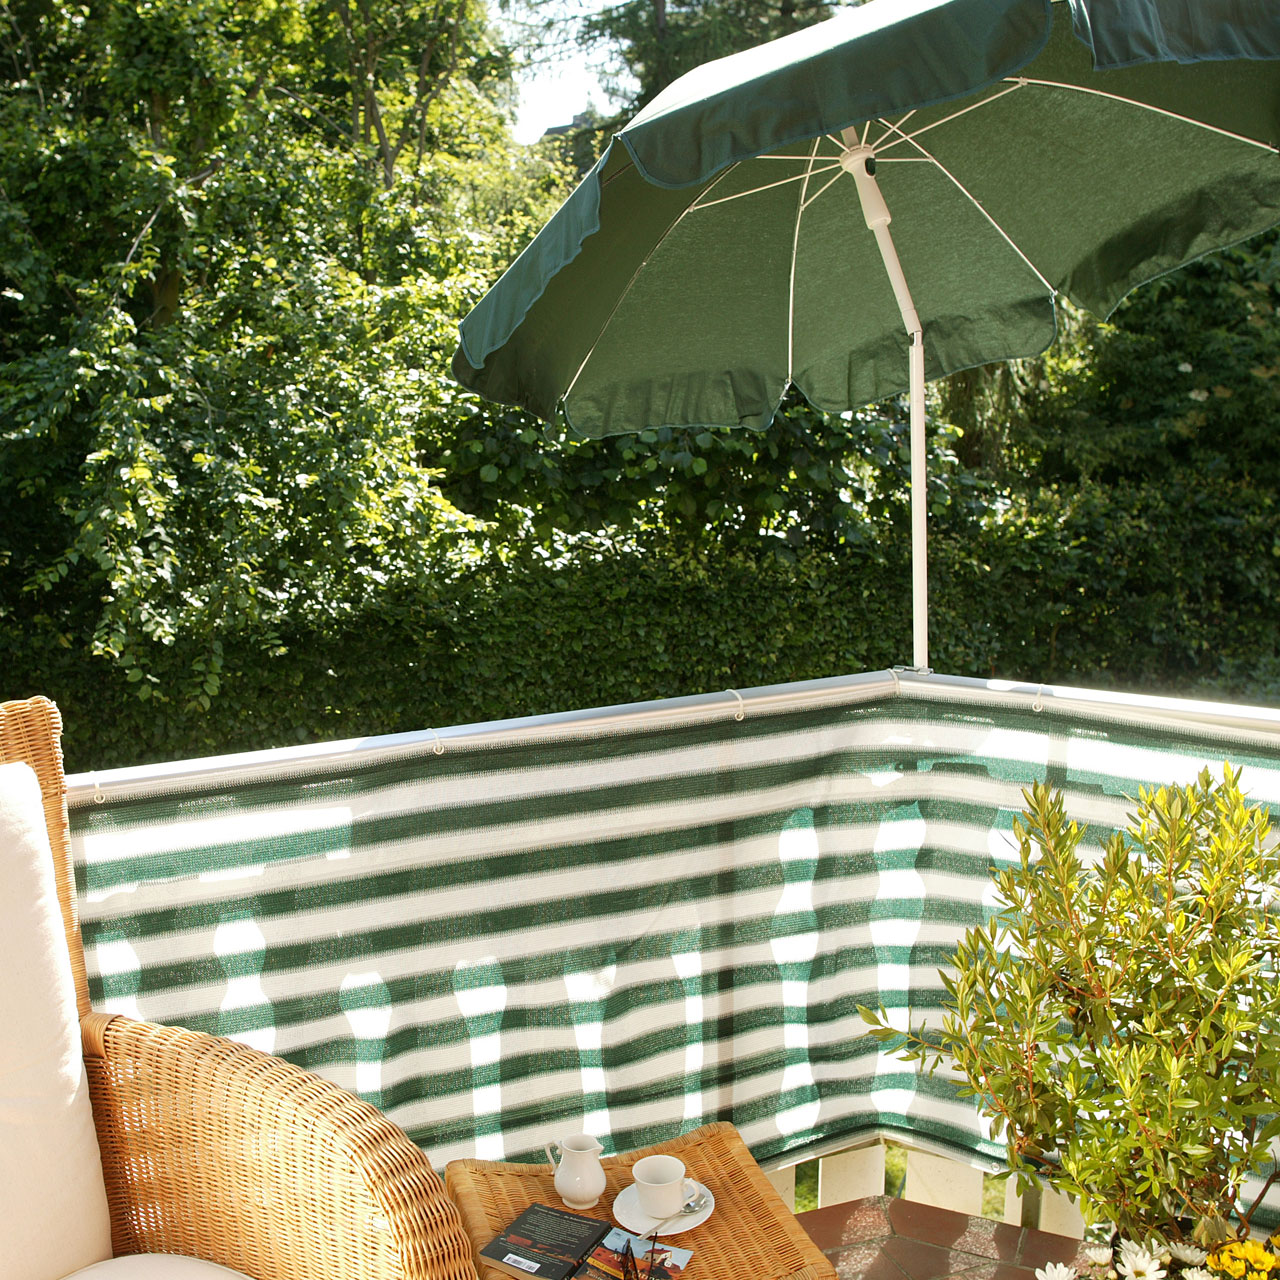 balkonbespannung pe classic gr n wei sichtschutz. Black Bedroom Furniture Sets. Home Design Ideas